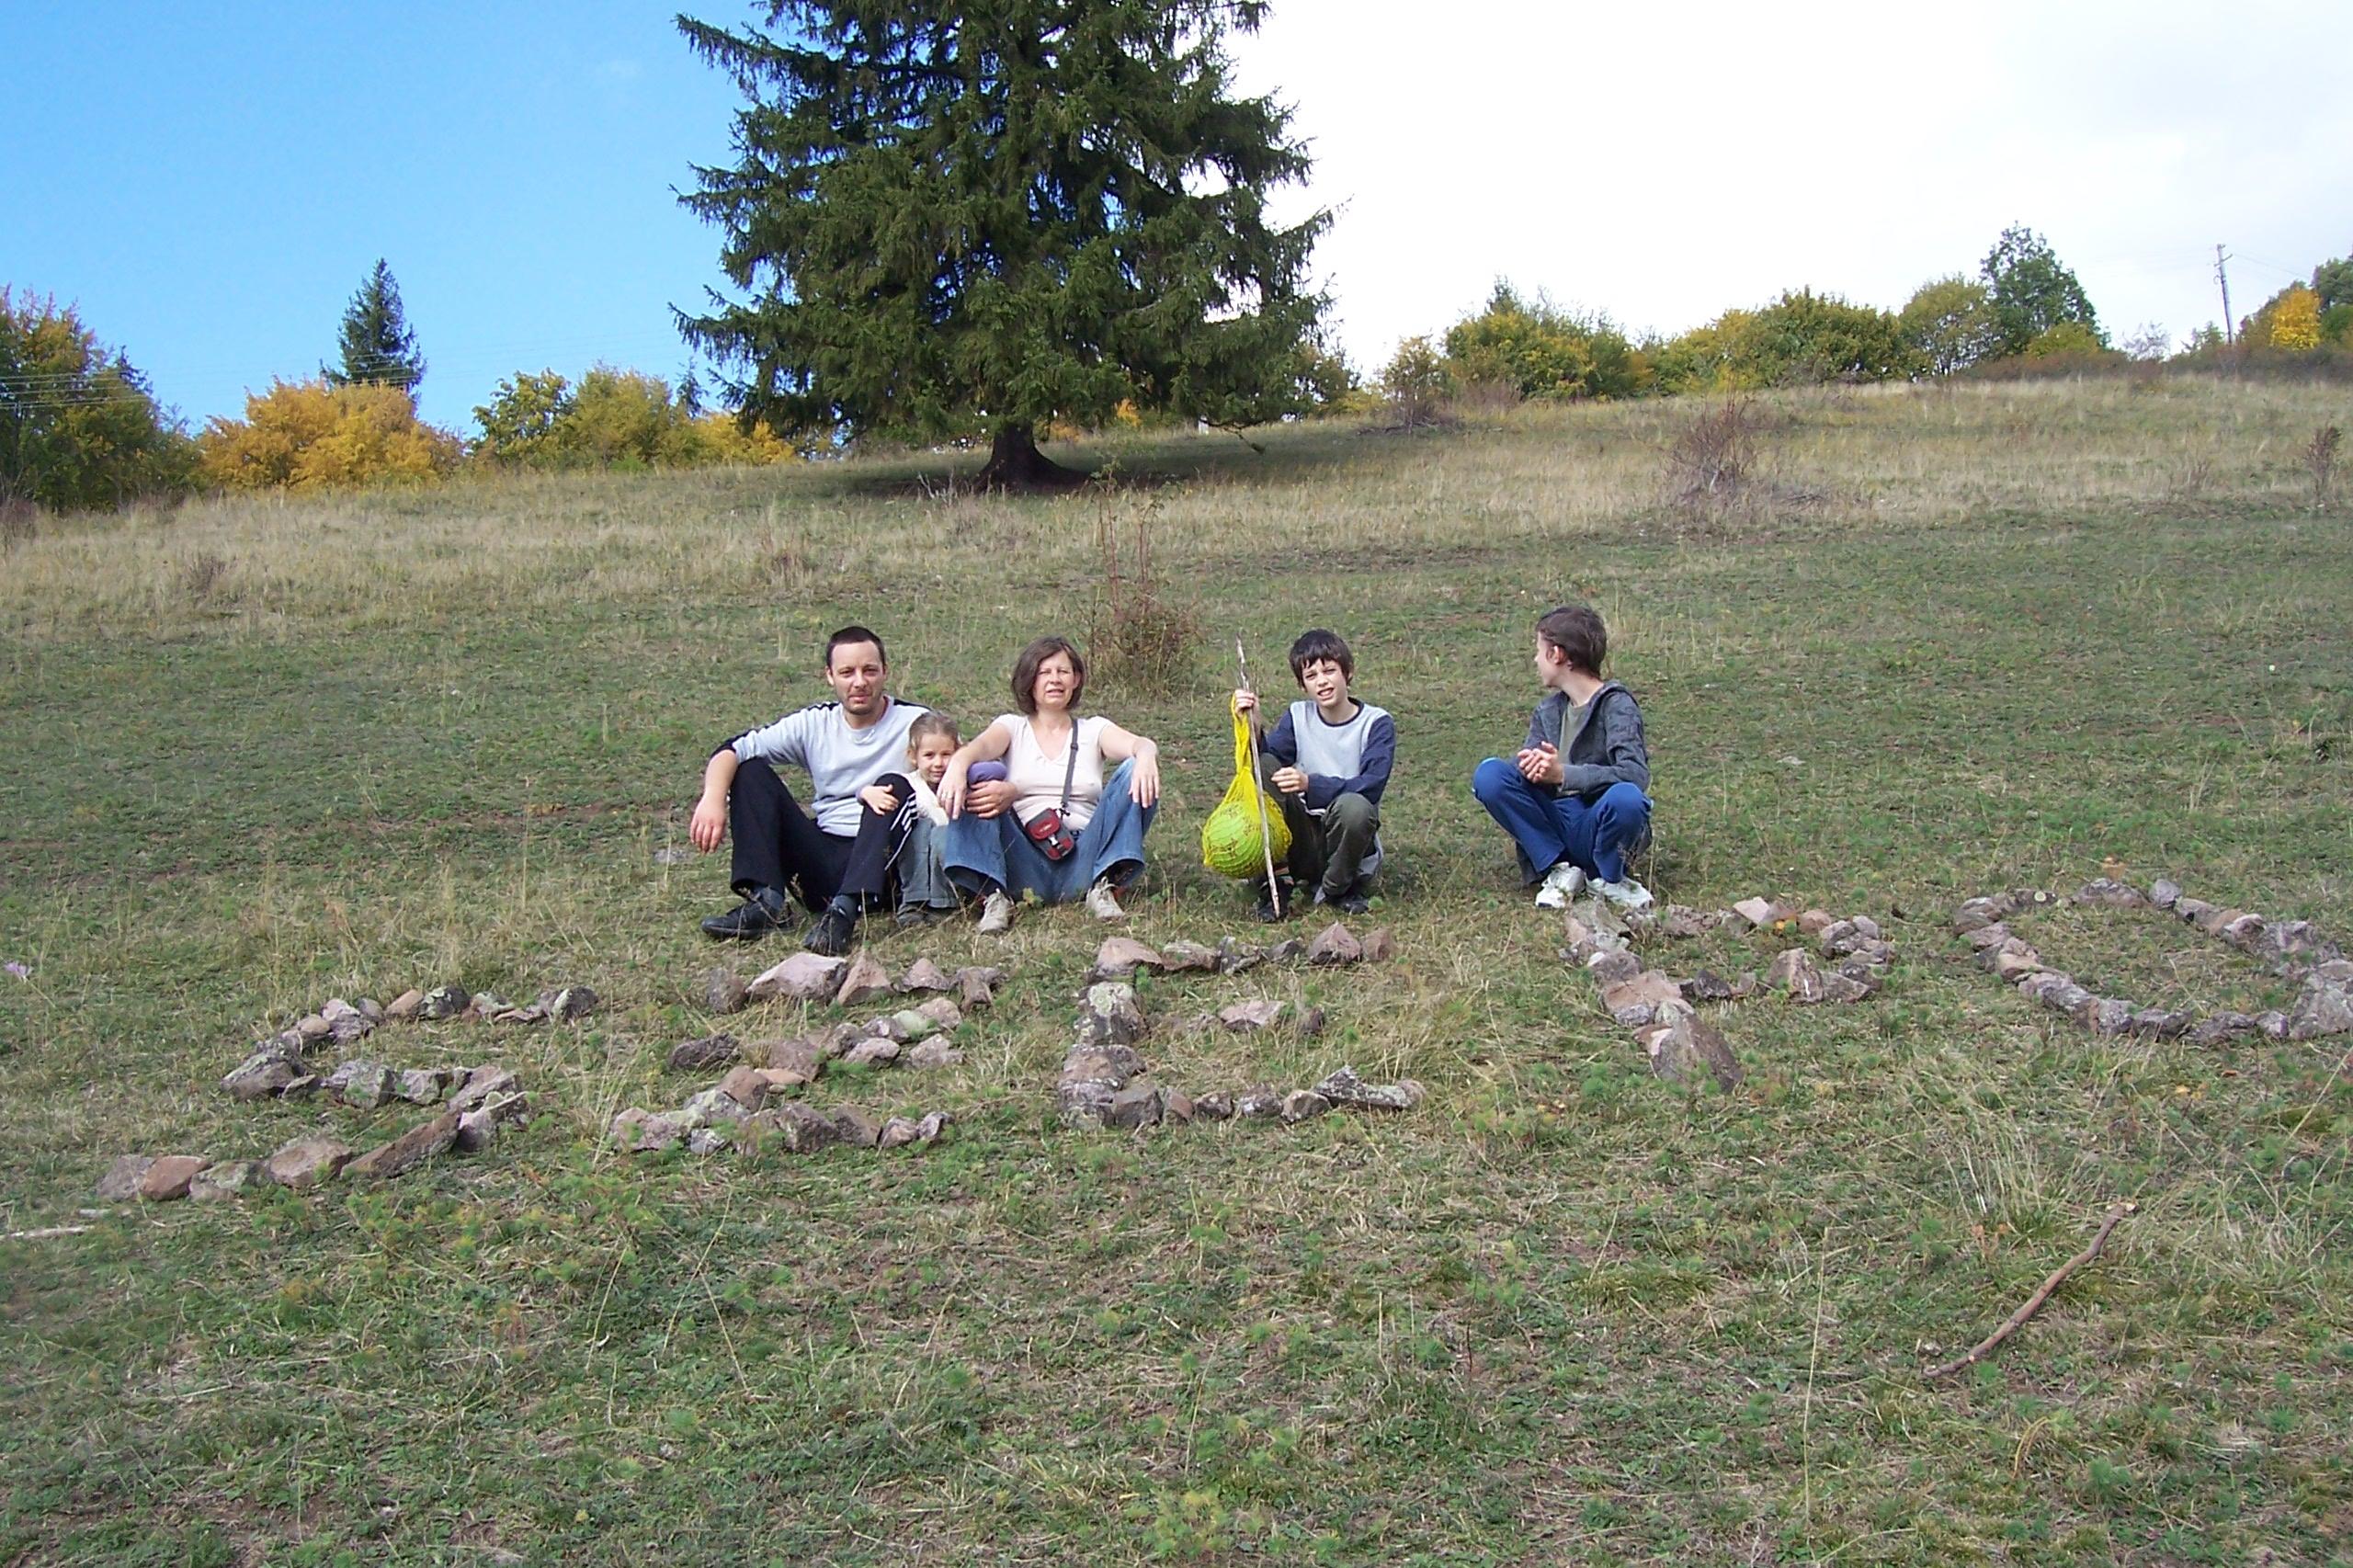 Interjú a fák alatt - Summa Philosophiae Normalis